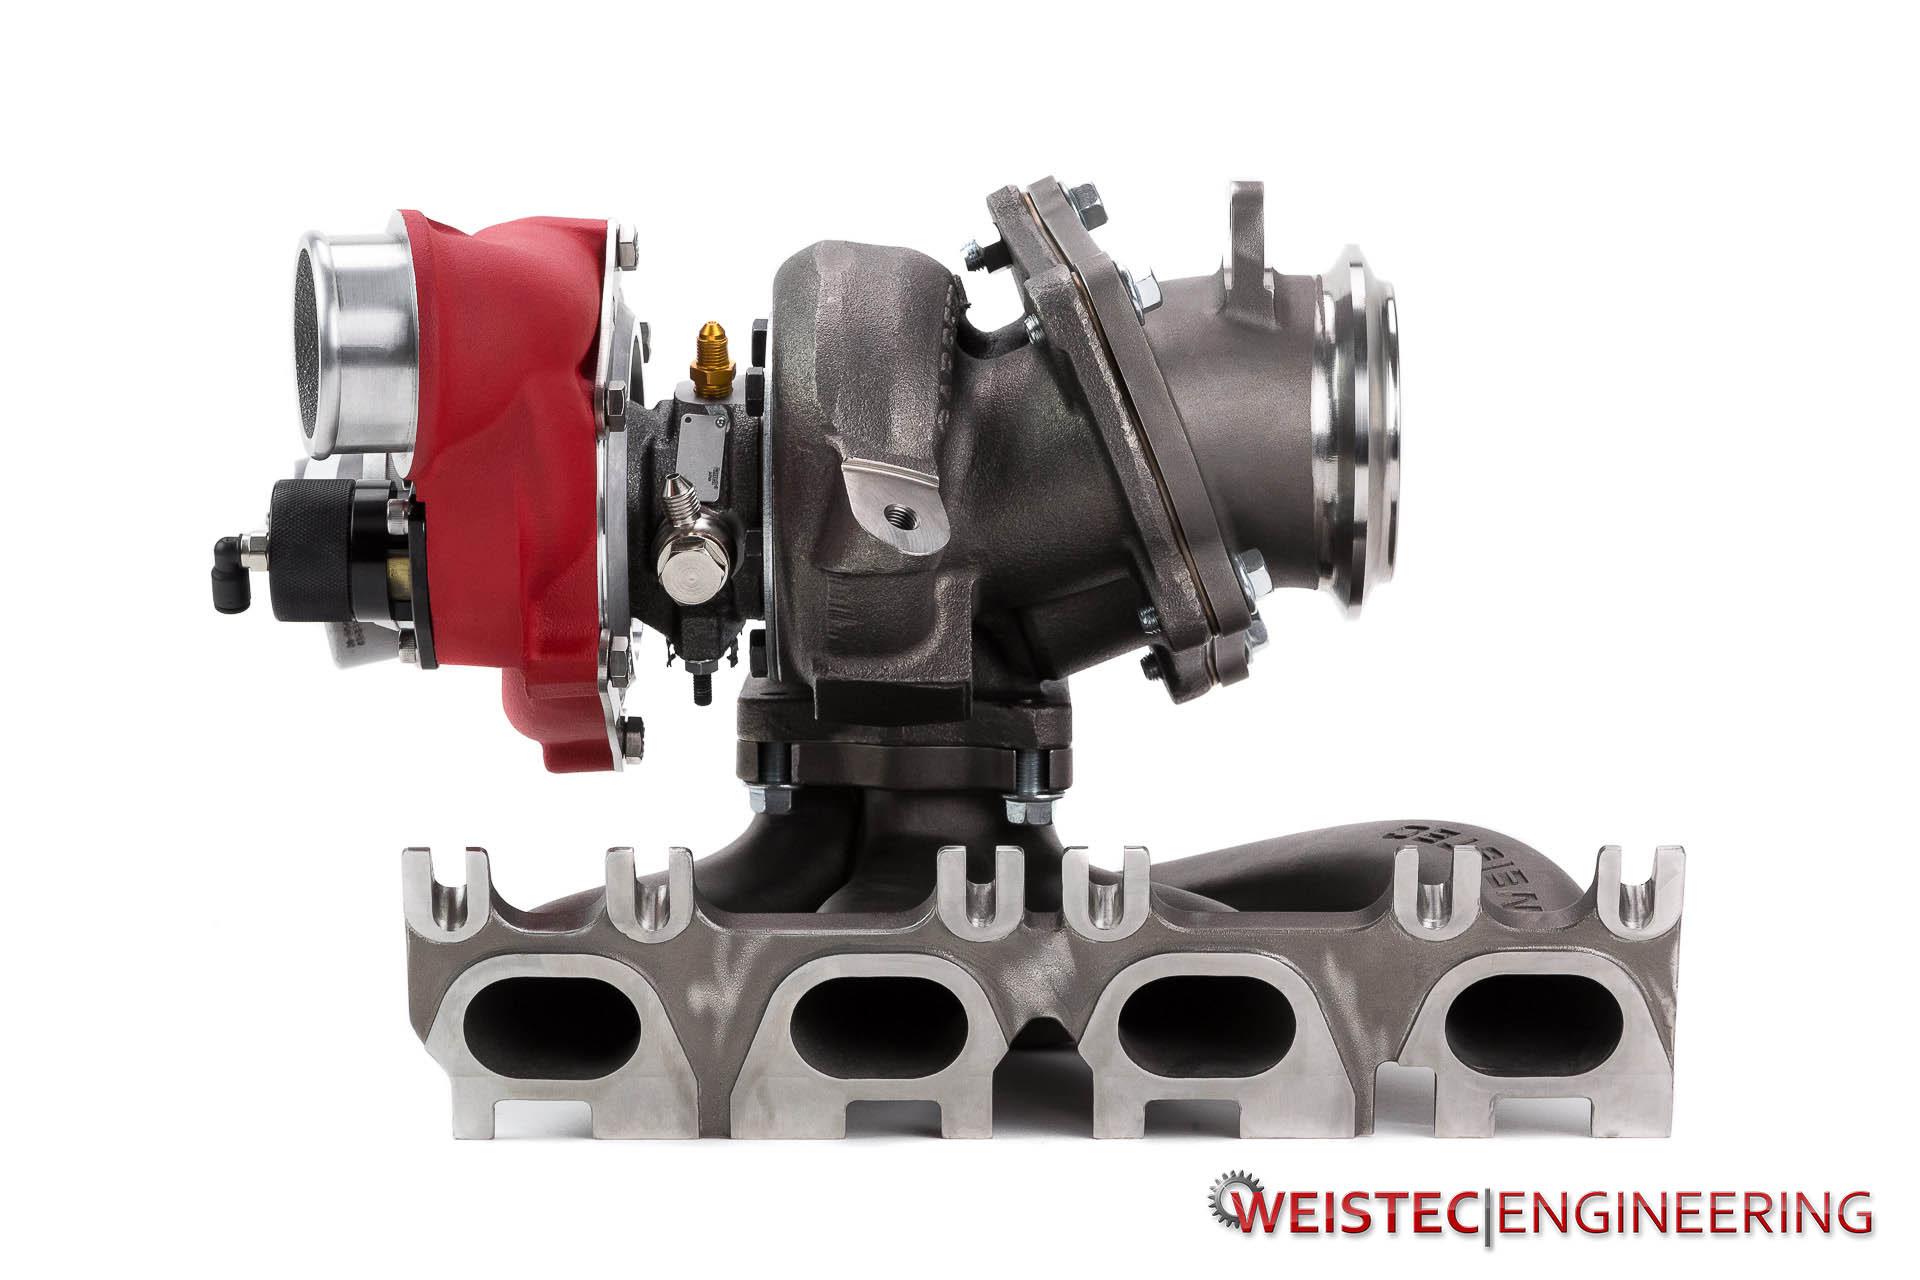 M133 W 4 Turbocharger Tuner System